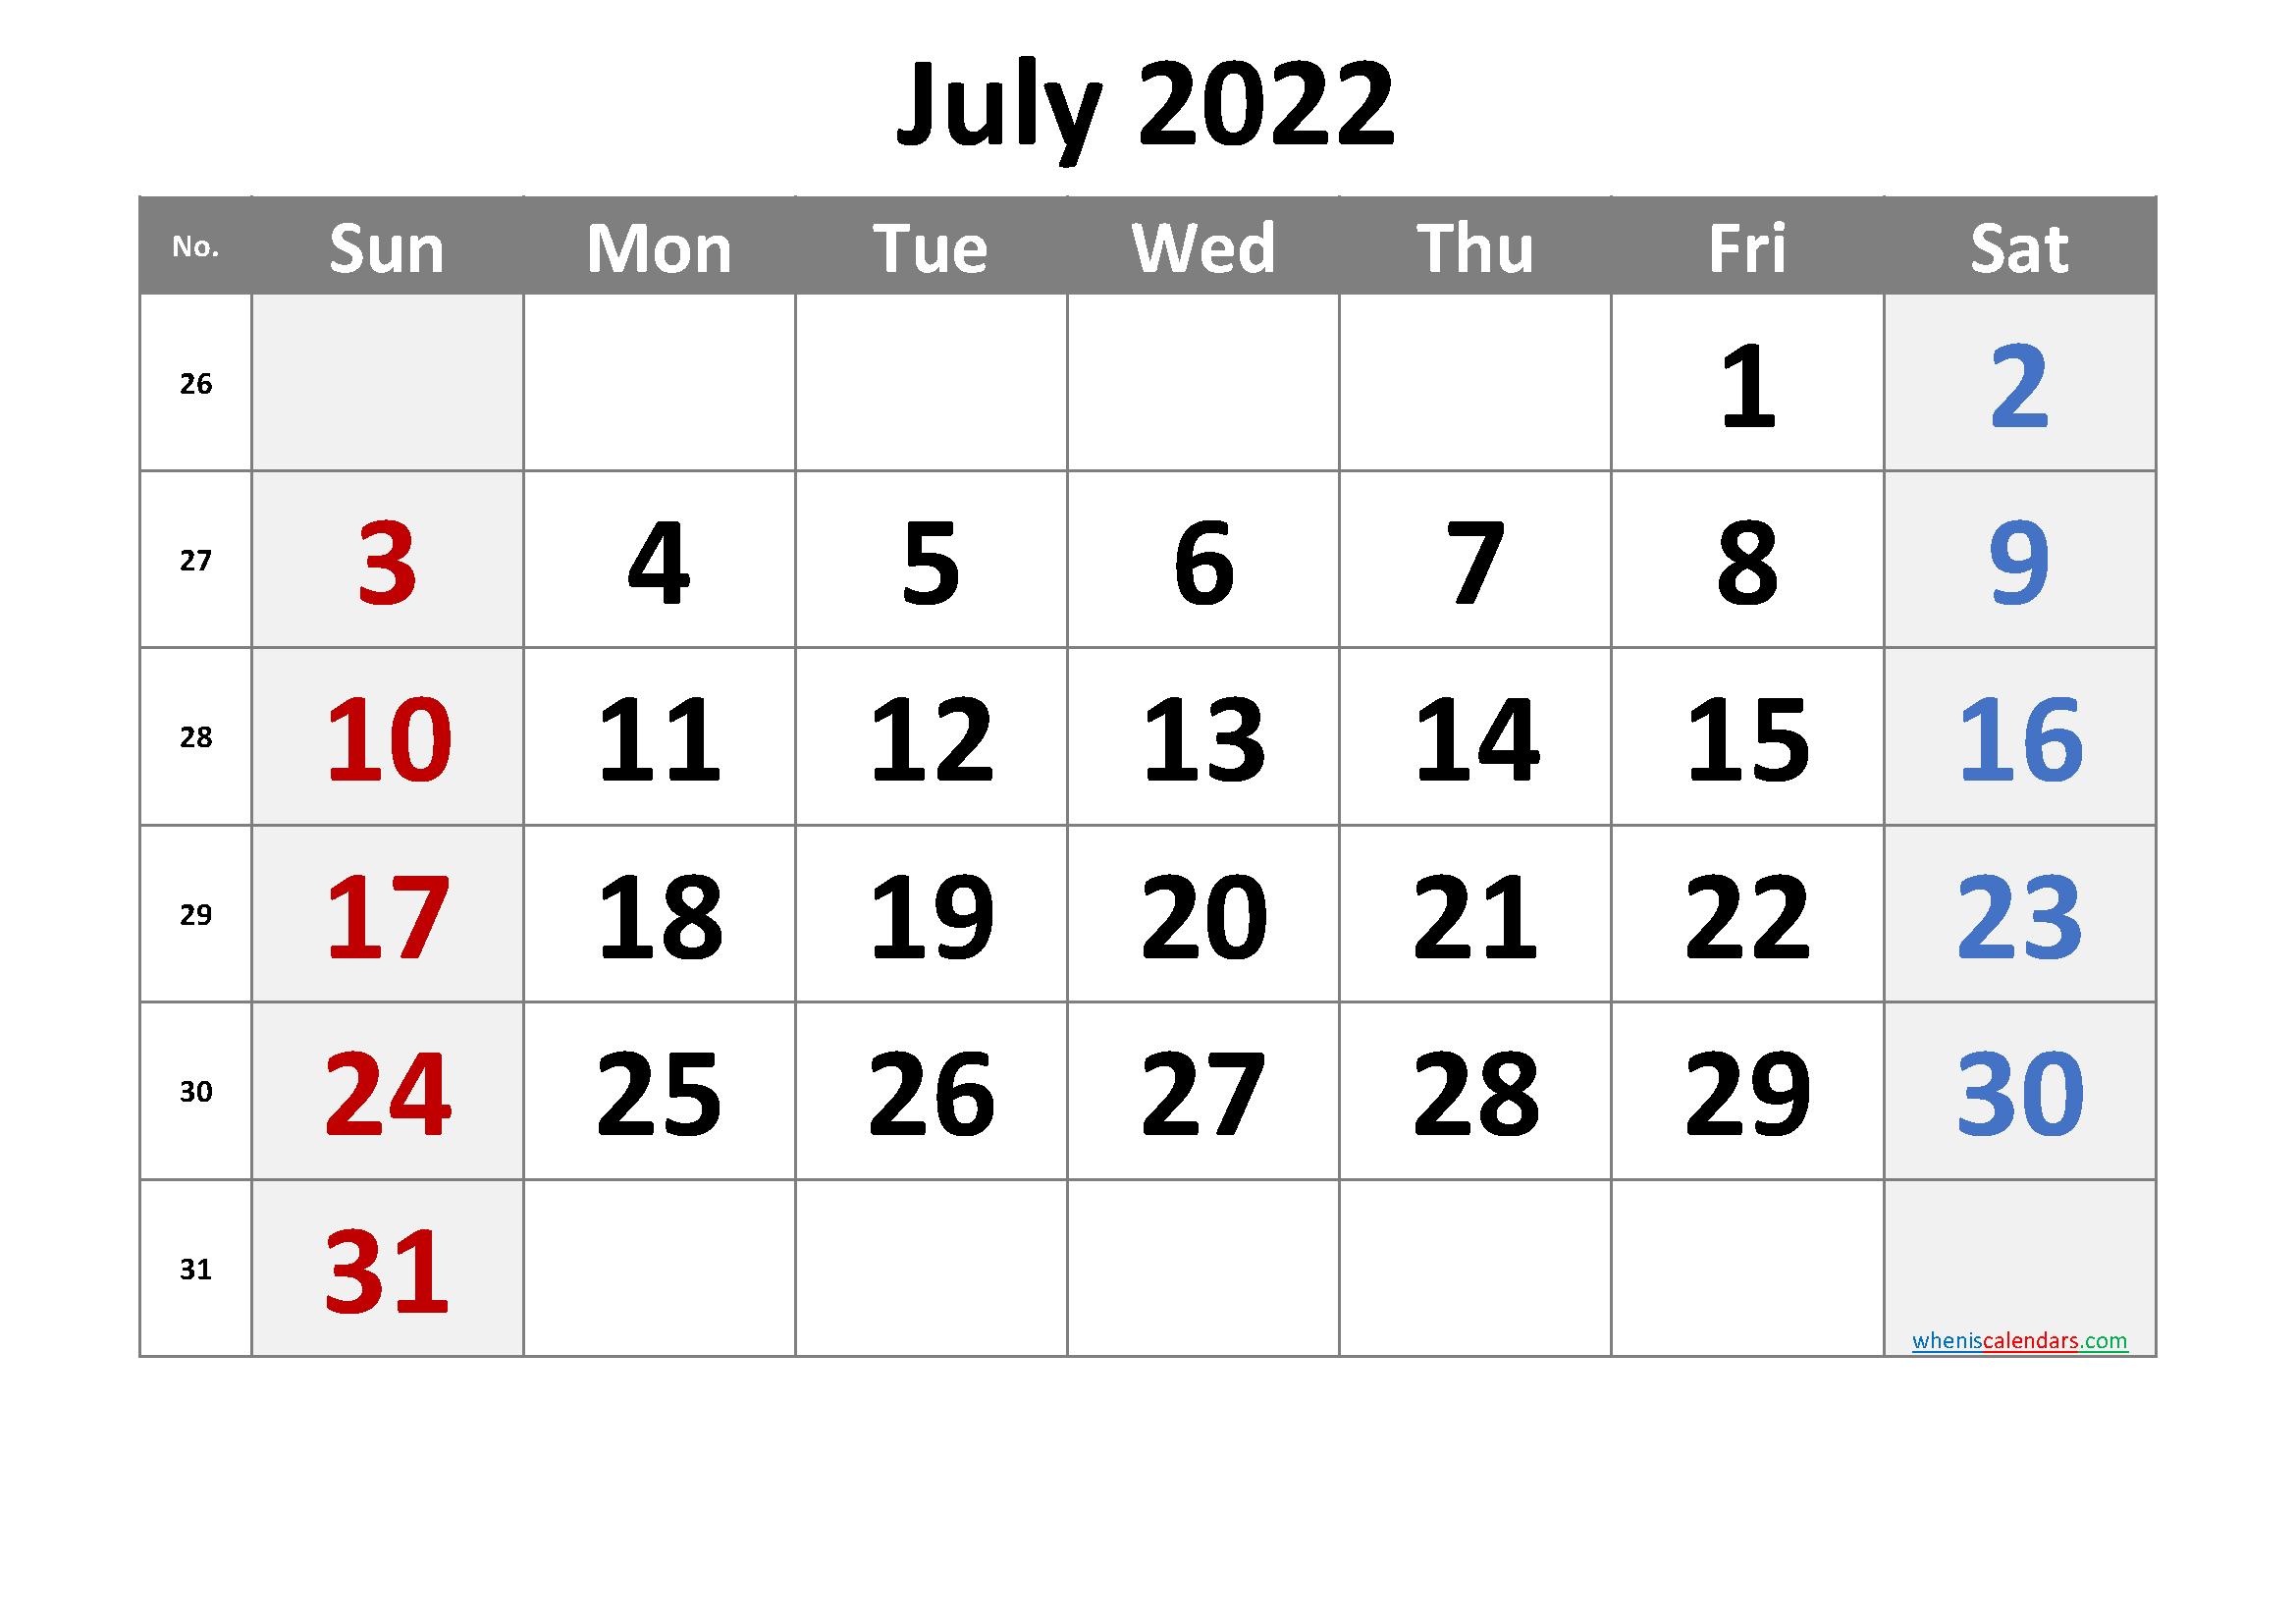 2022 July Calendar.Free Printable 2022 July Calendar Free Printable 2021 Monthly Calendar With Holidays